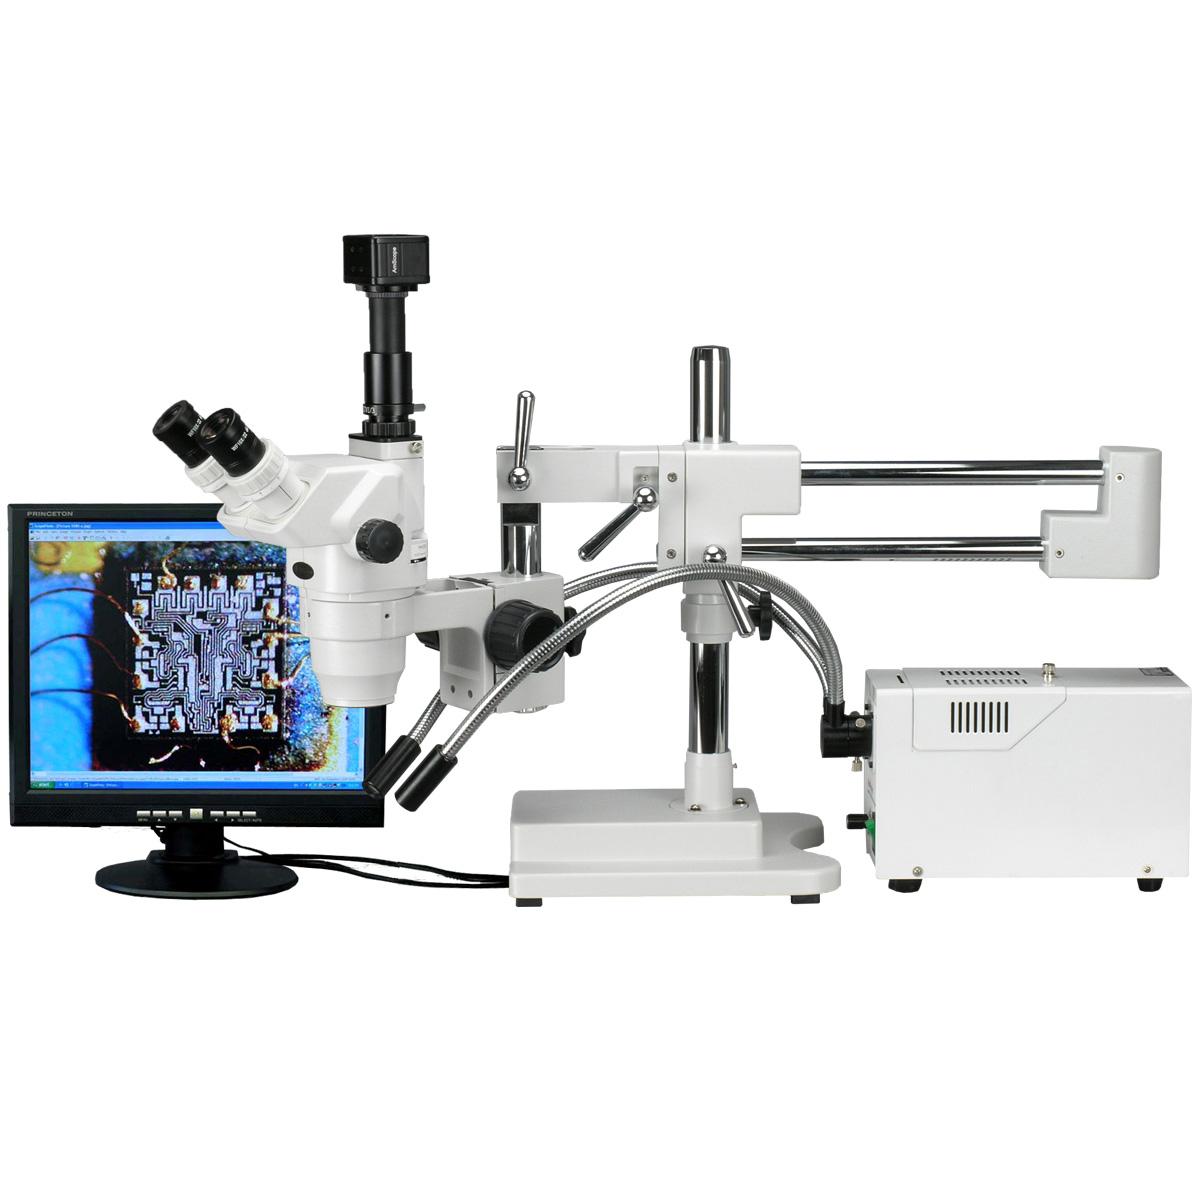 AmScope 2X-225X Trinocular Stereo Zoom Microscope + 5MP Digital Camera by United Scope